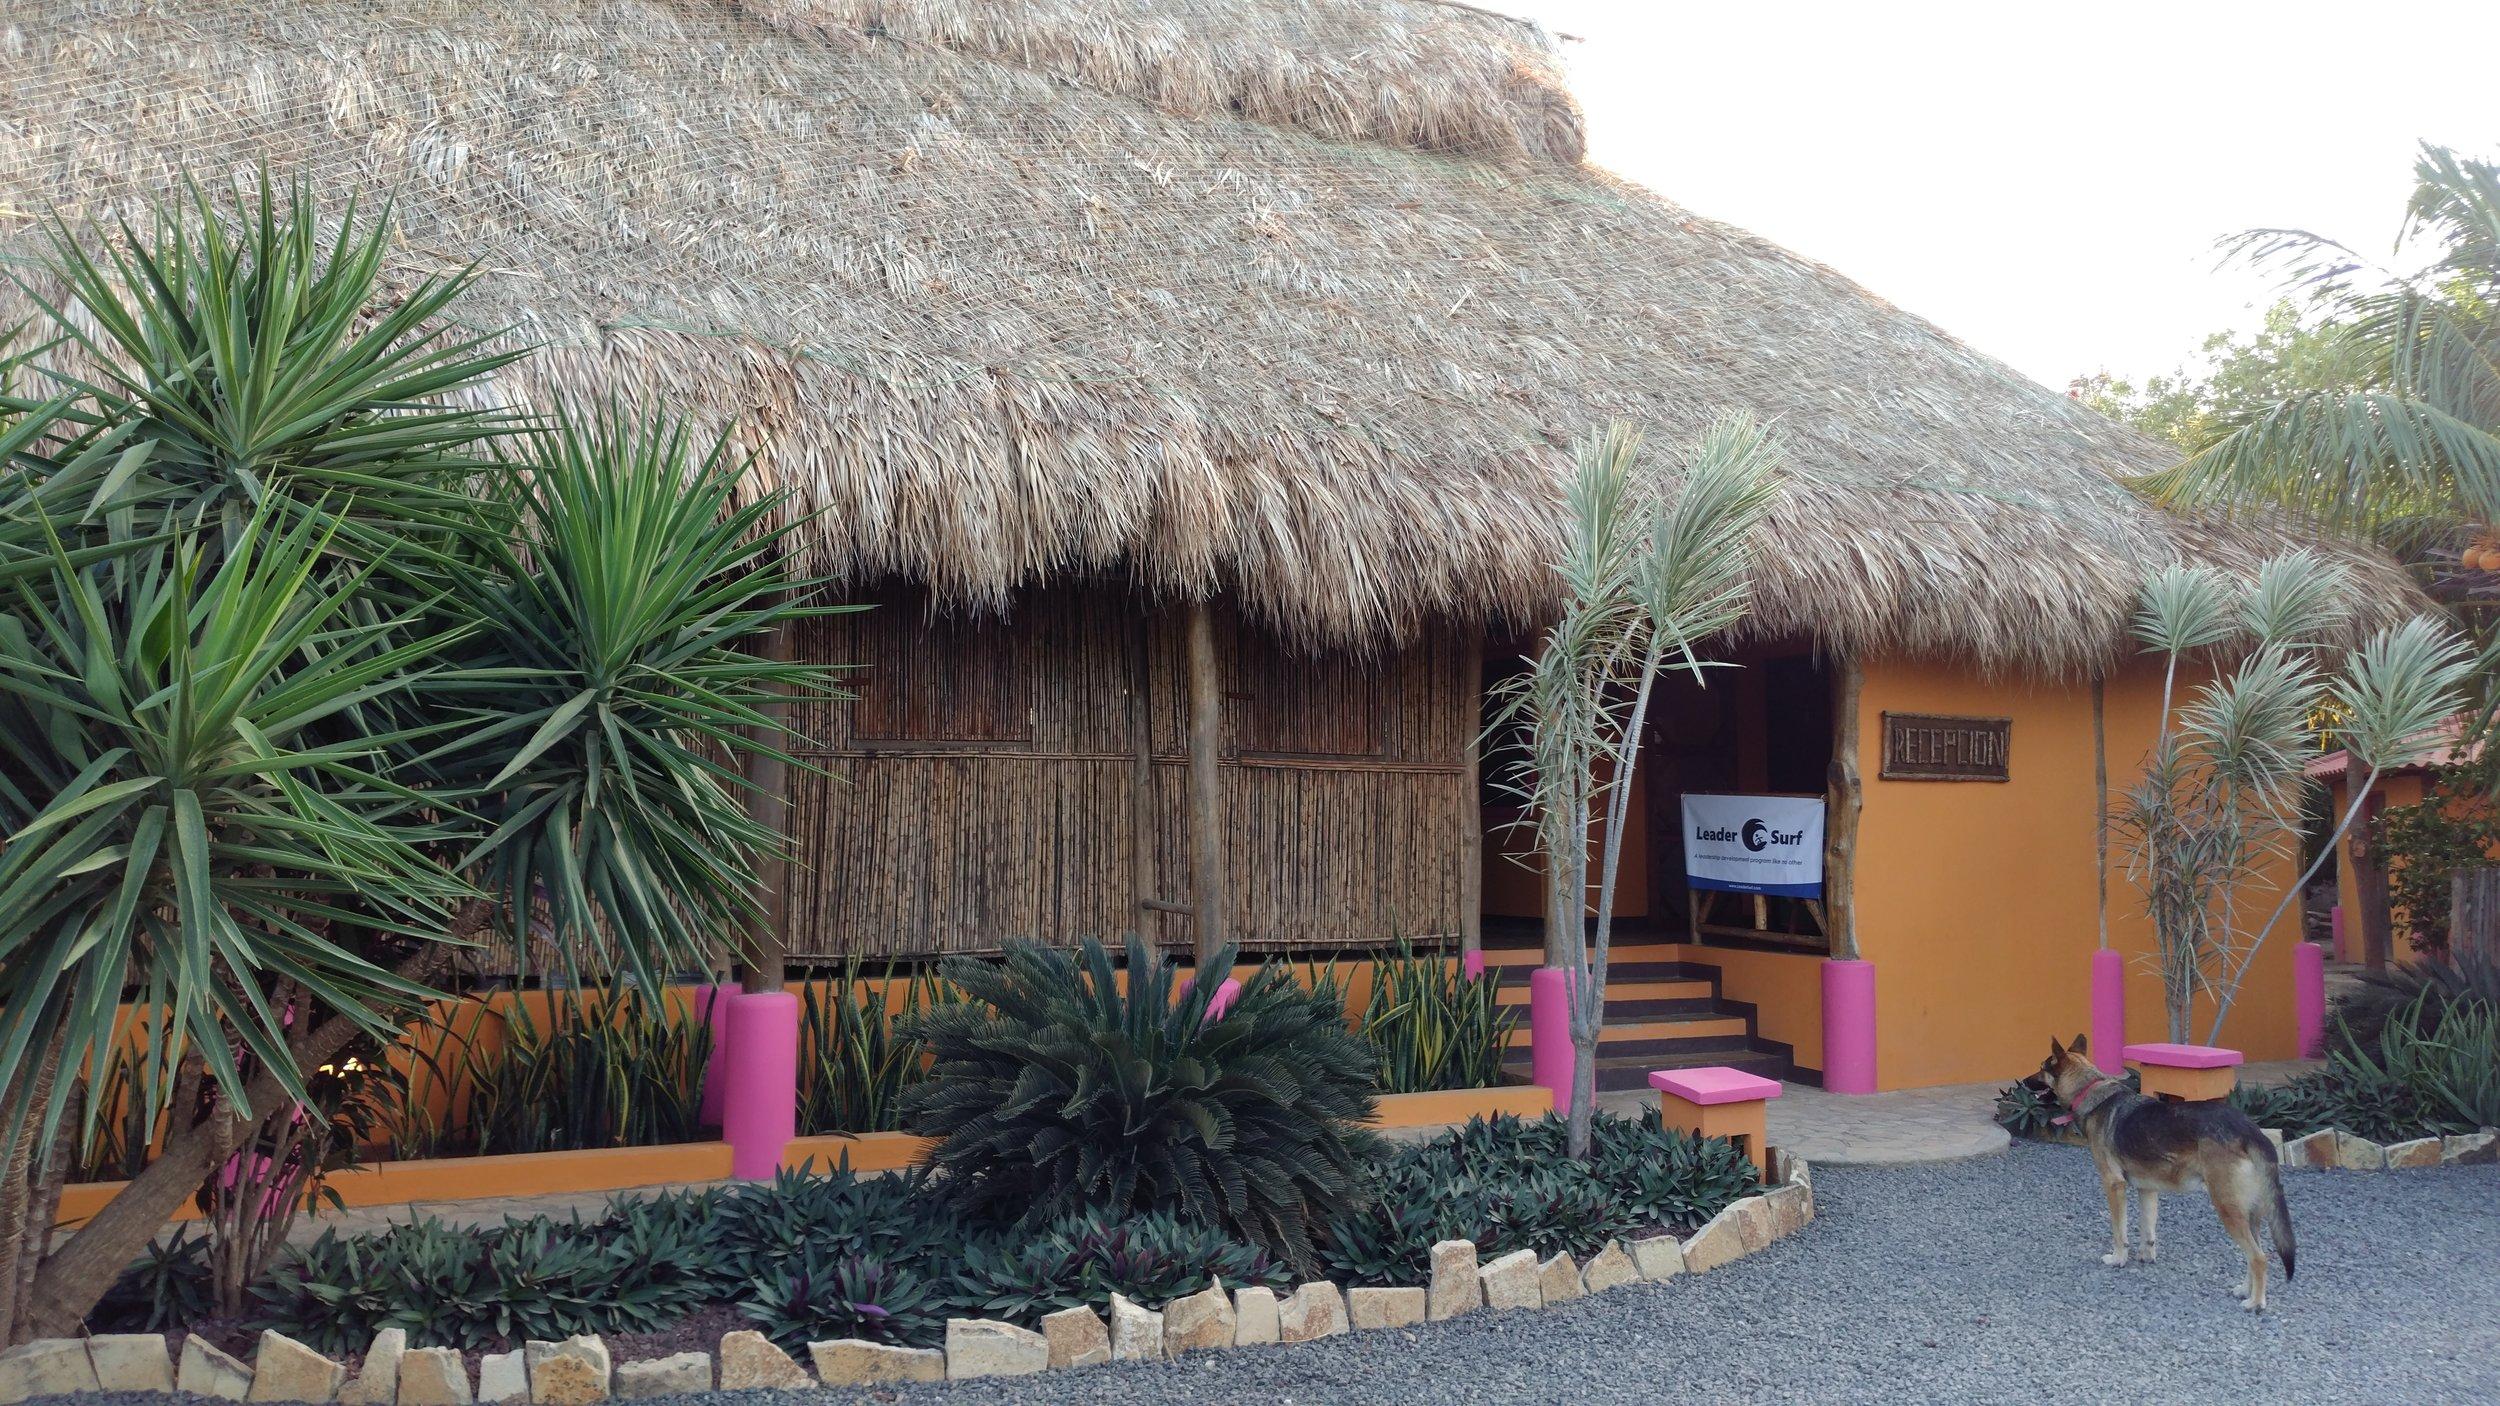 Entrance to the Buena Onda Beach Resort